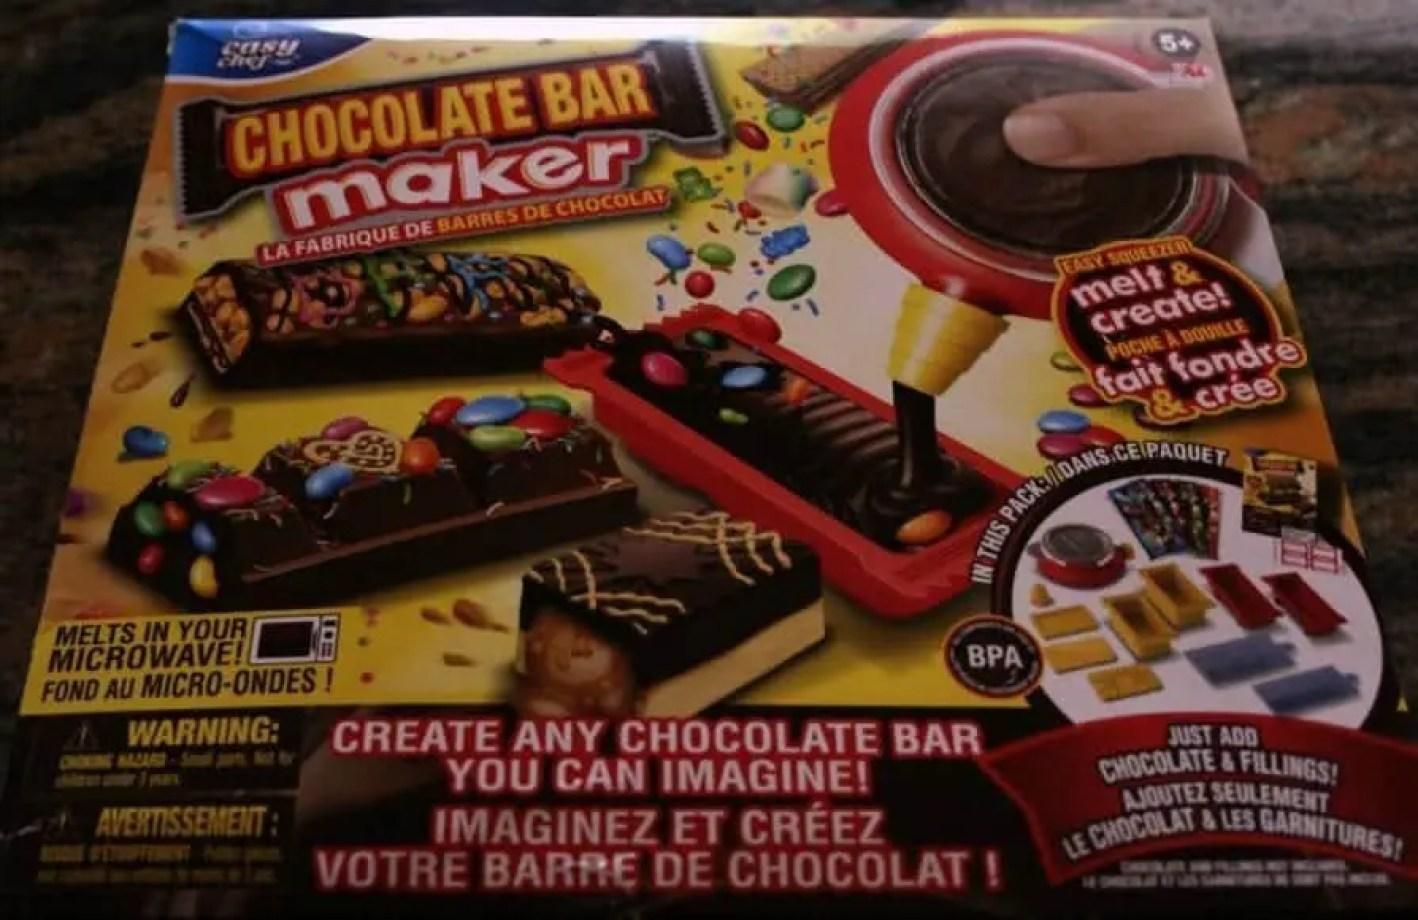 Chocolate bar maker box